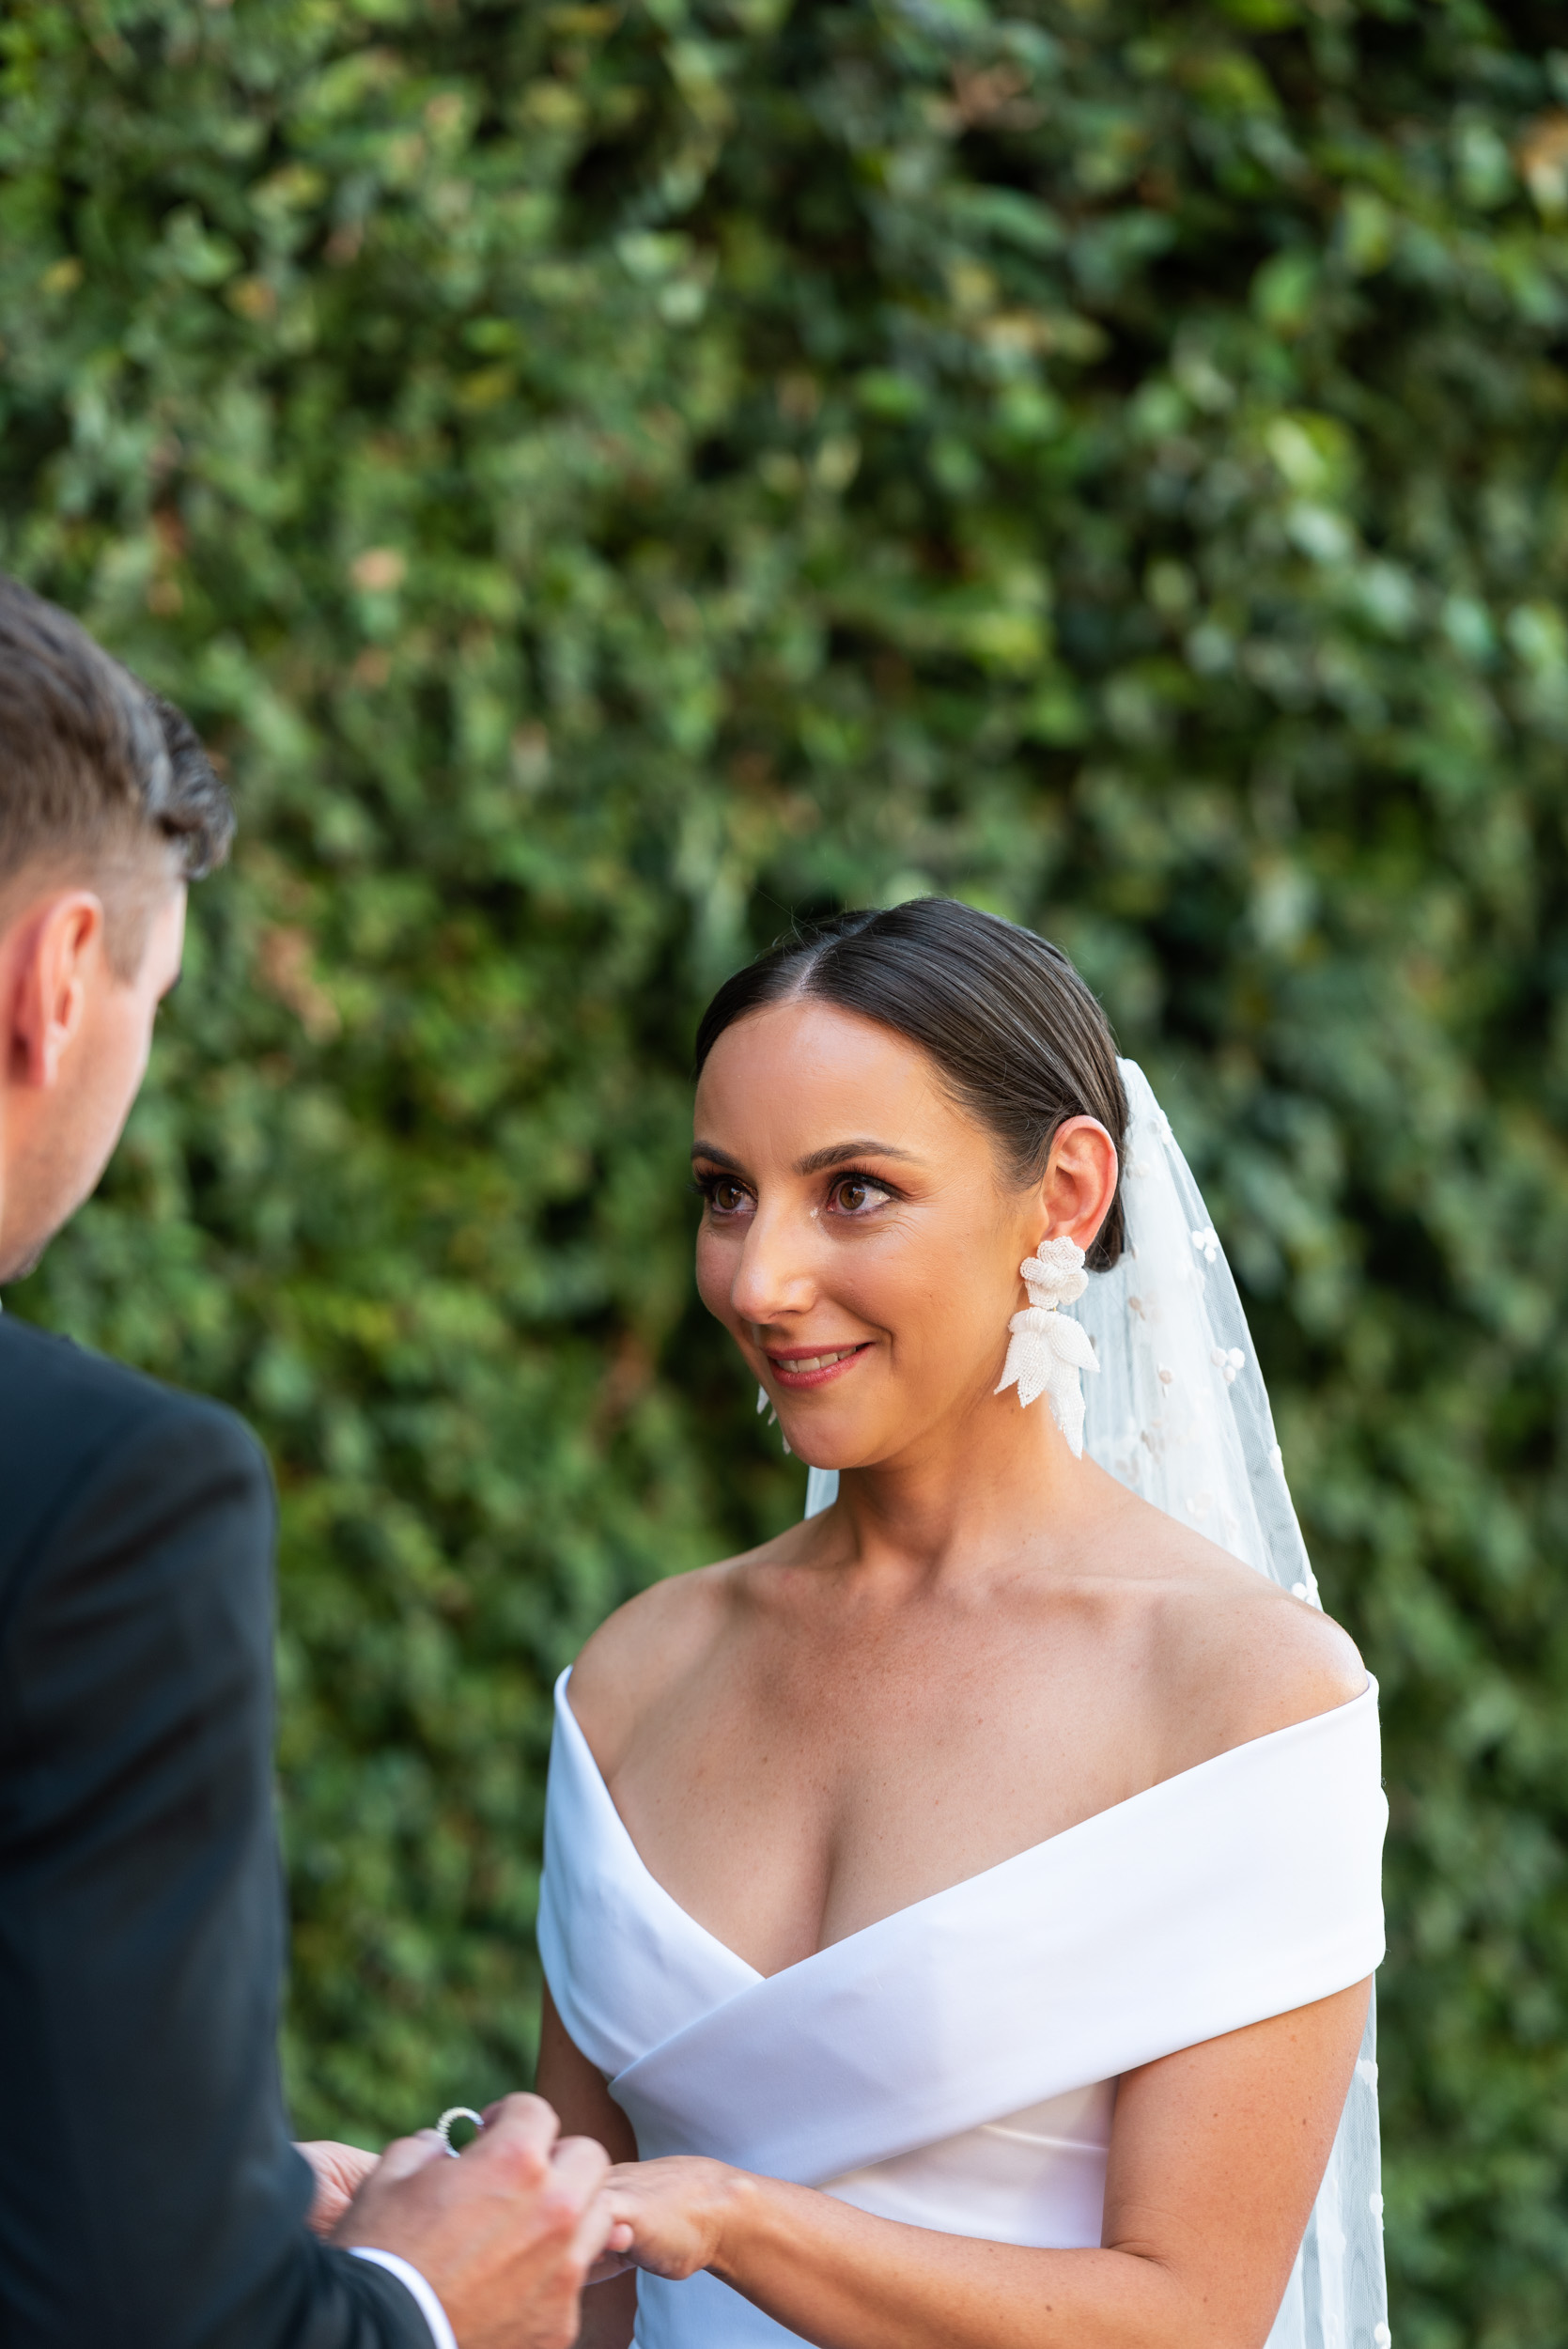 Bride, Wedding Day, Wedding, Wedding Ceremony